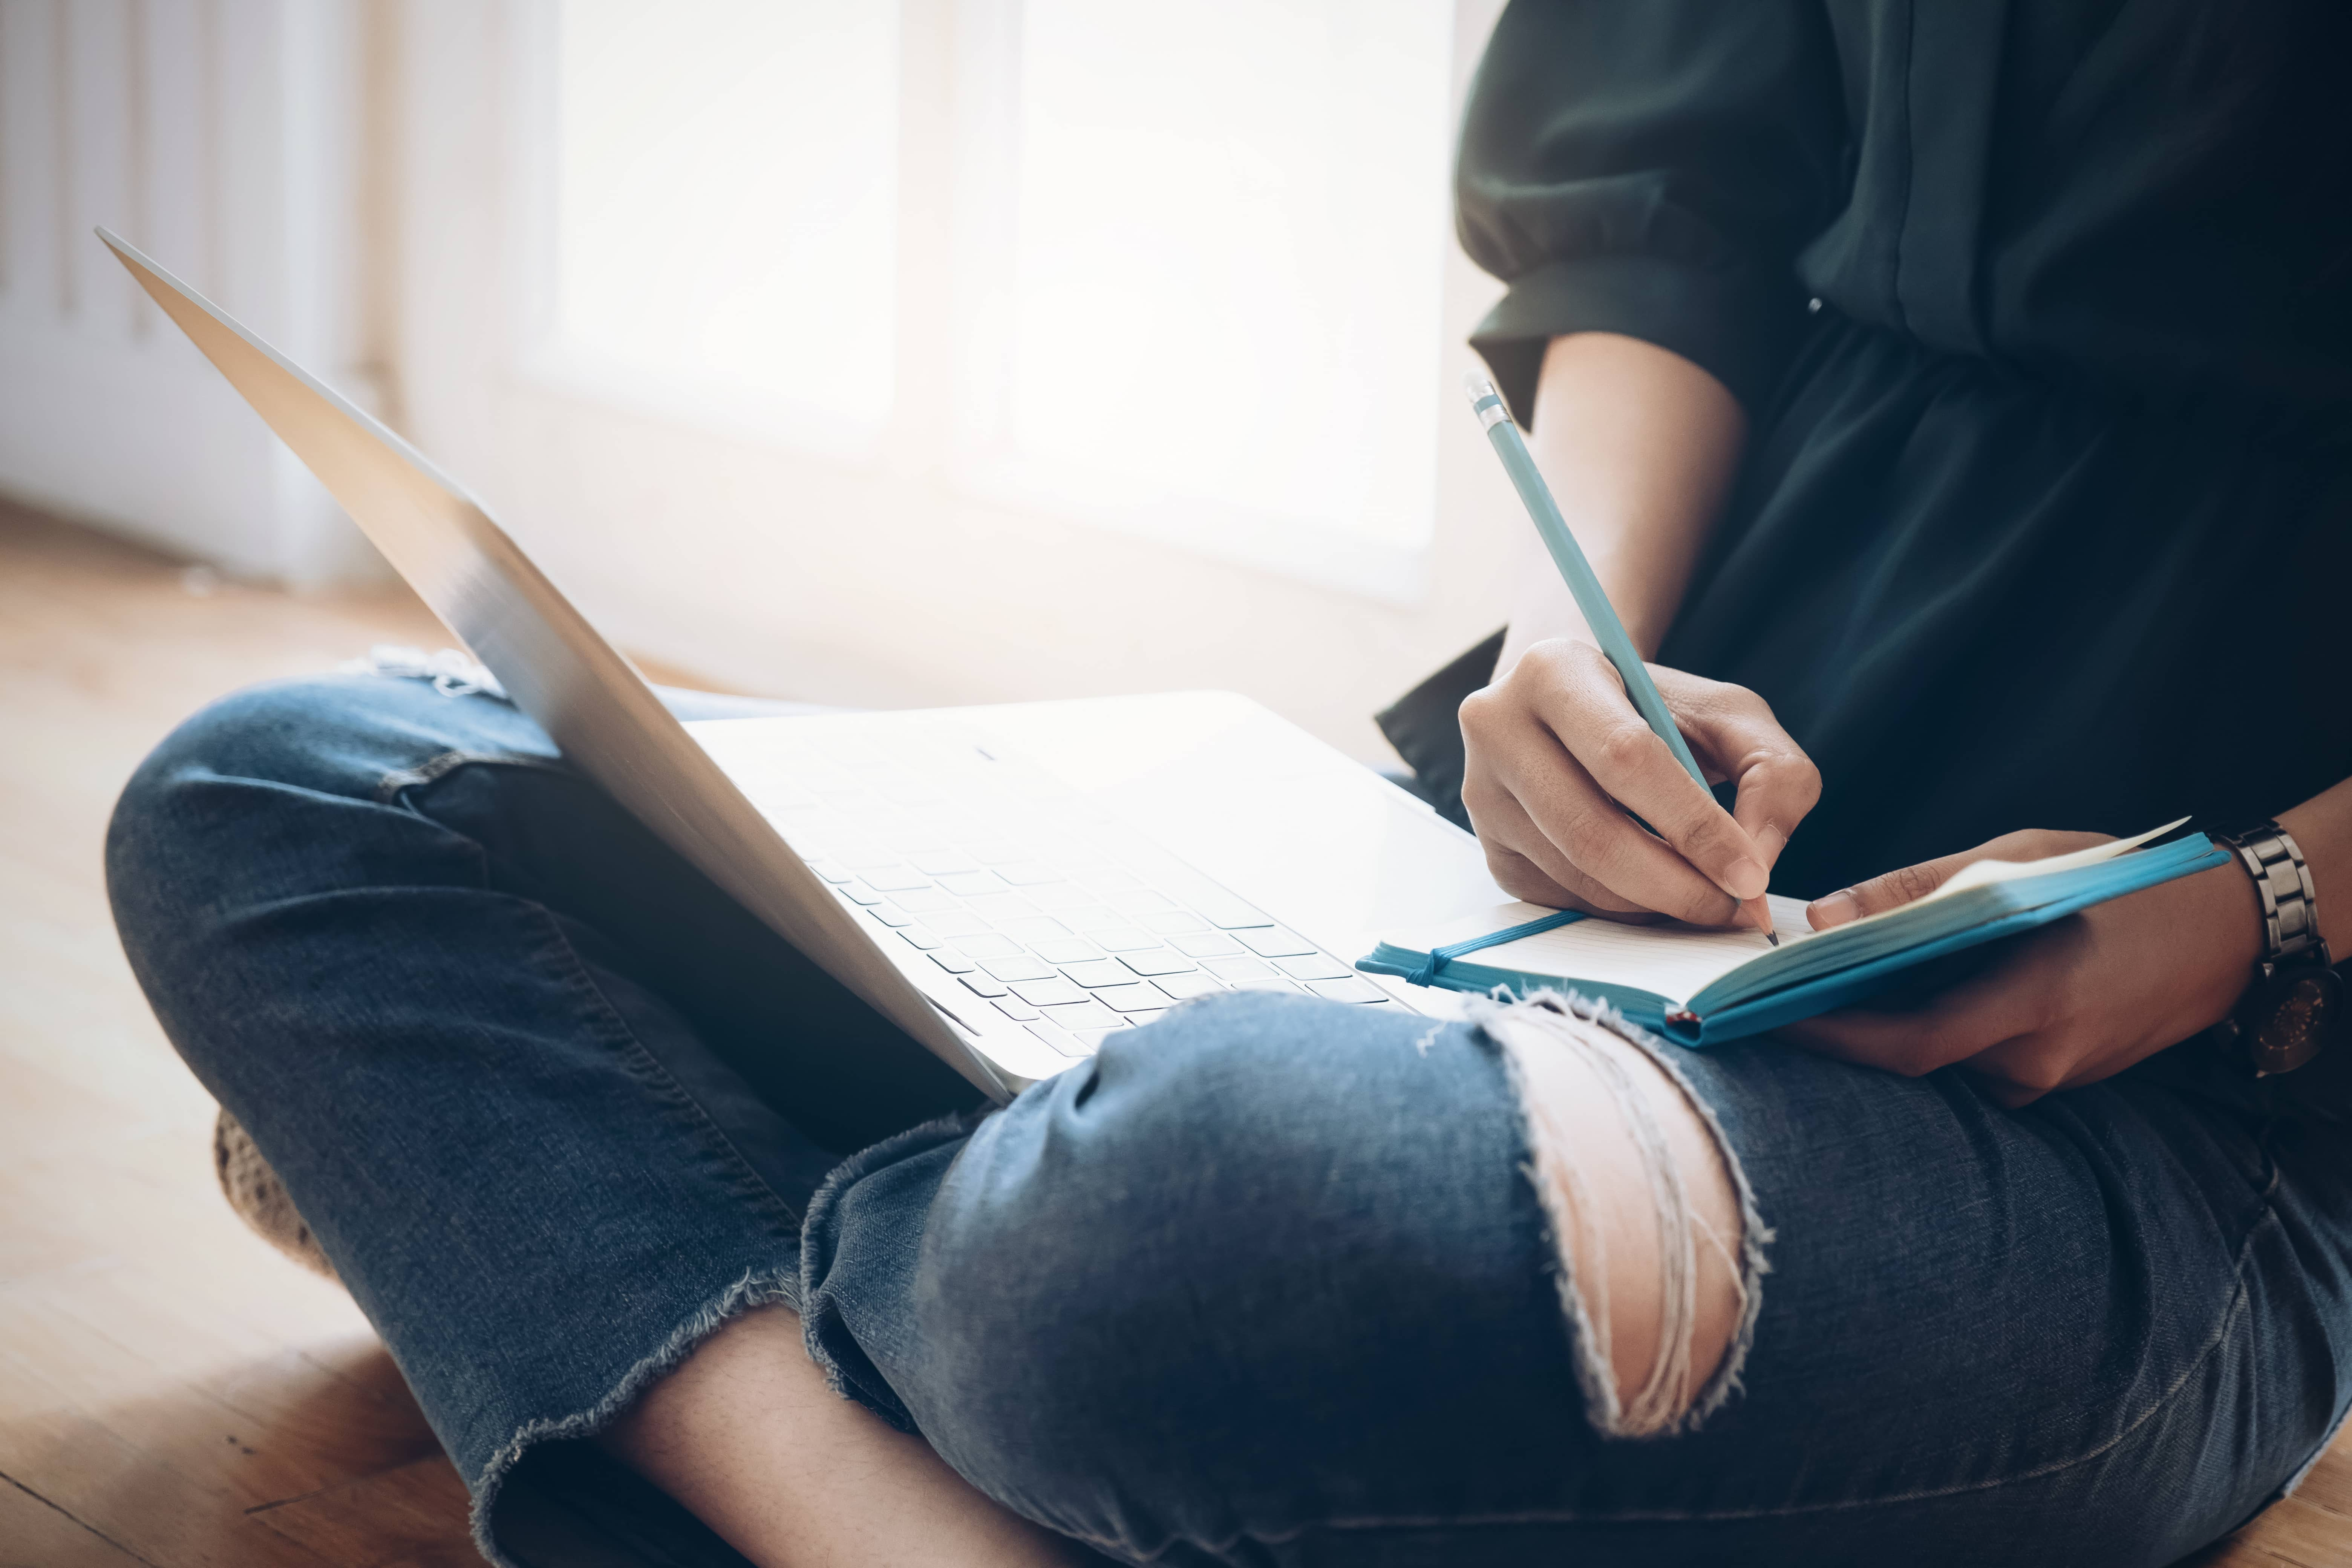 Woman journaling for greater self-awareness